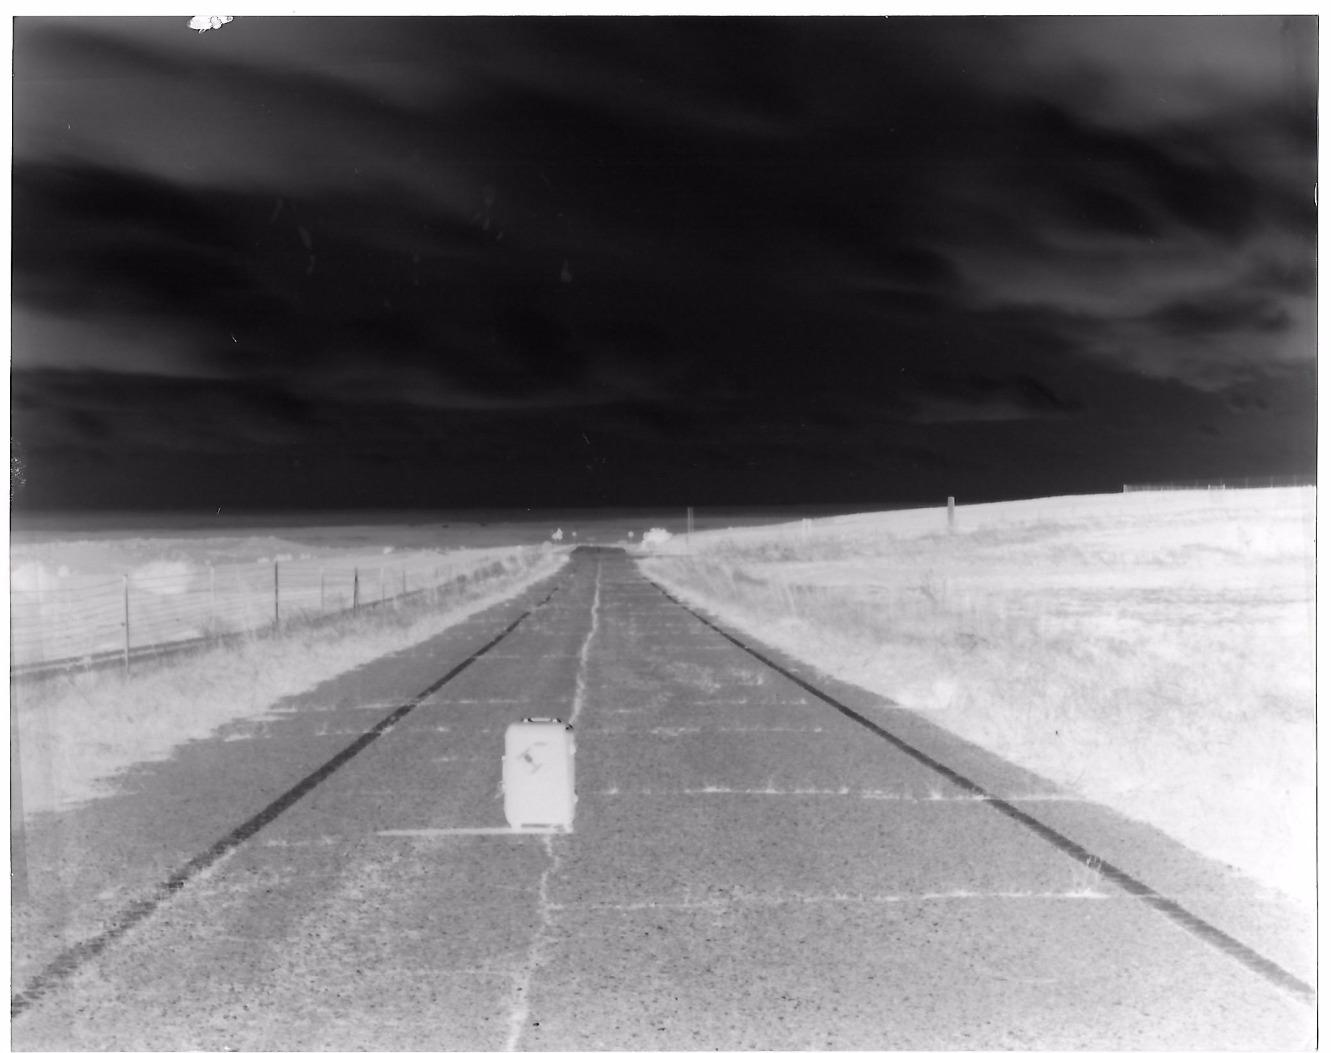 Road_edited